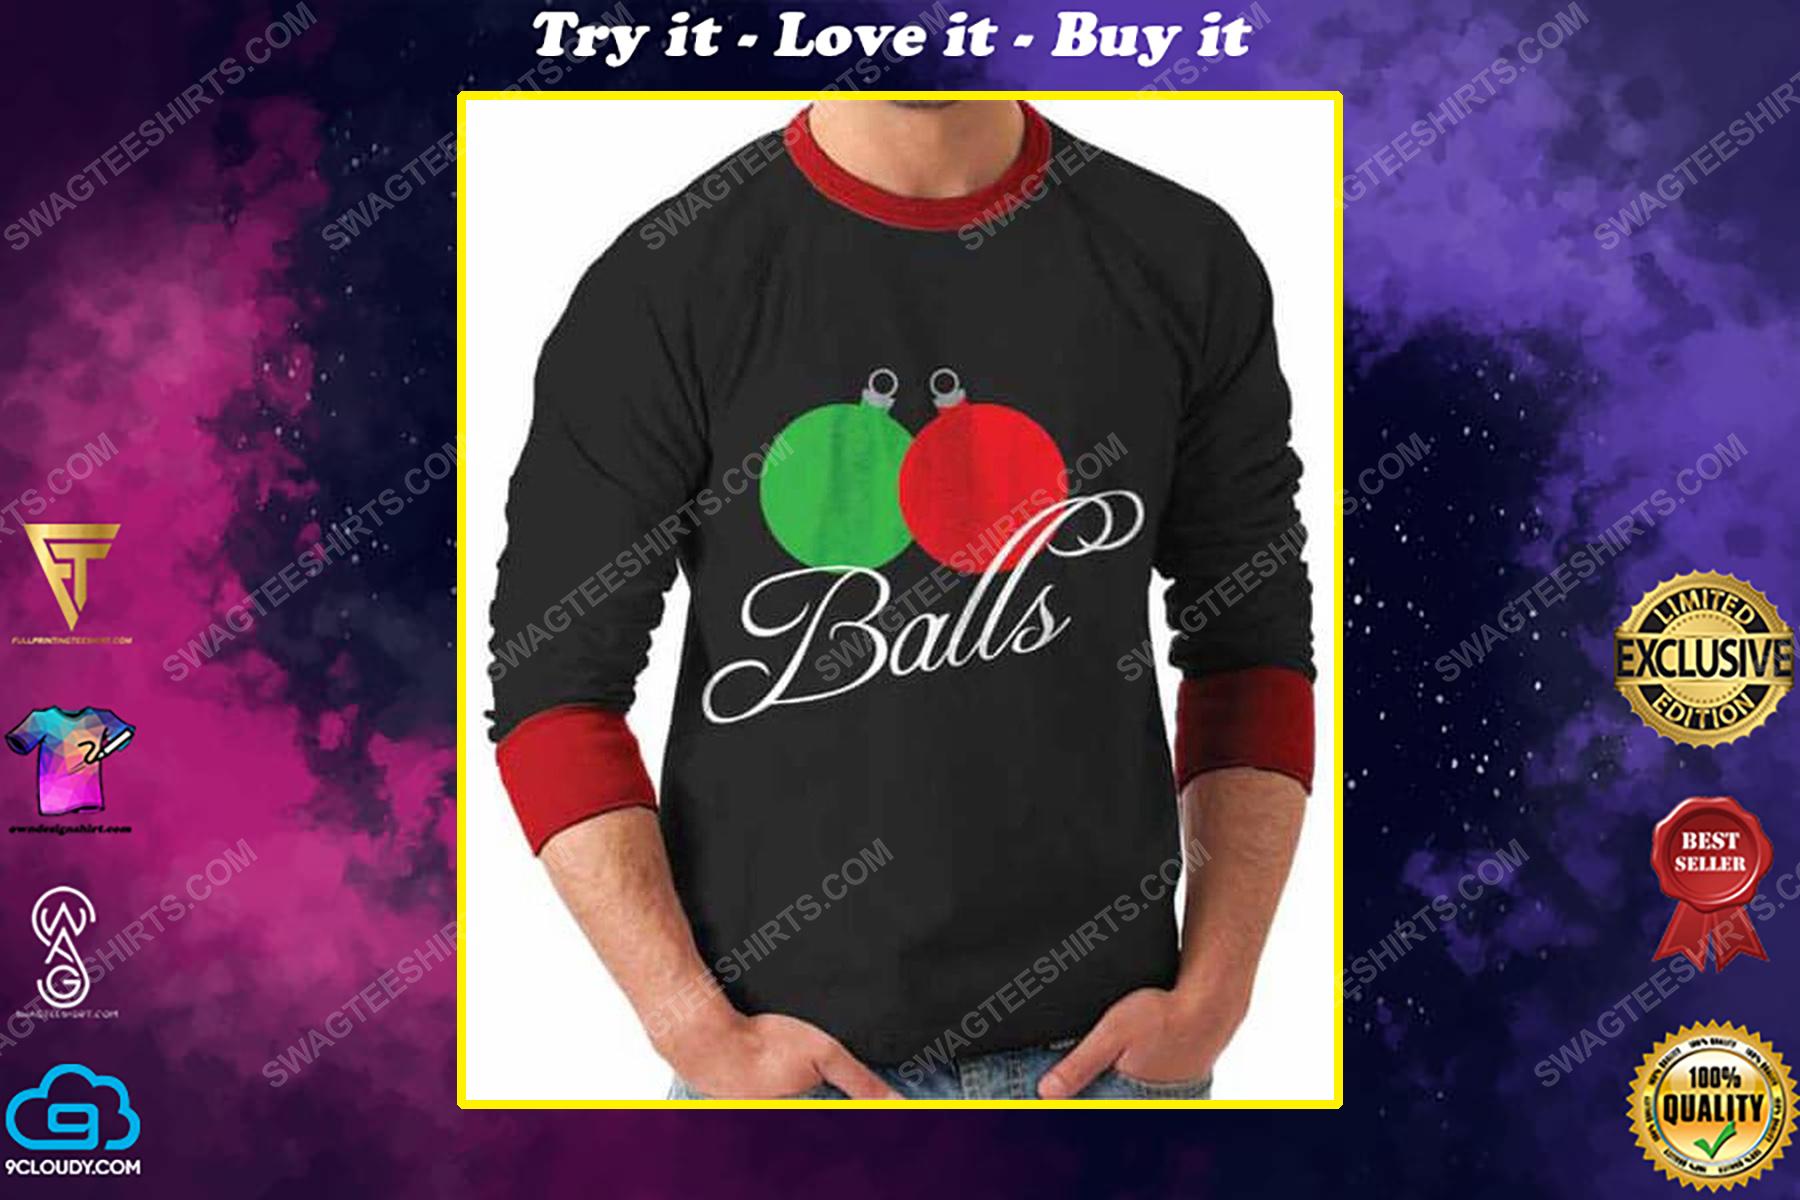 Balls lover full print ugly christmas sweater